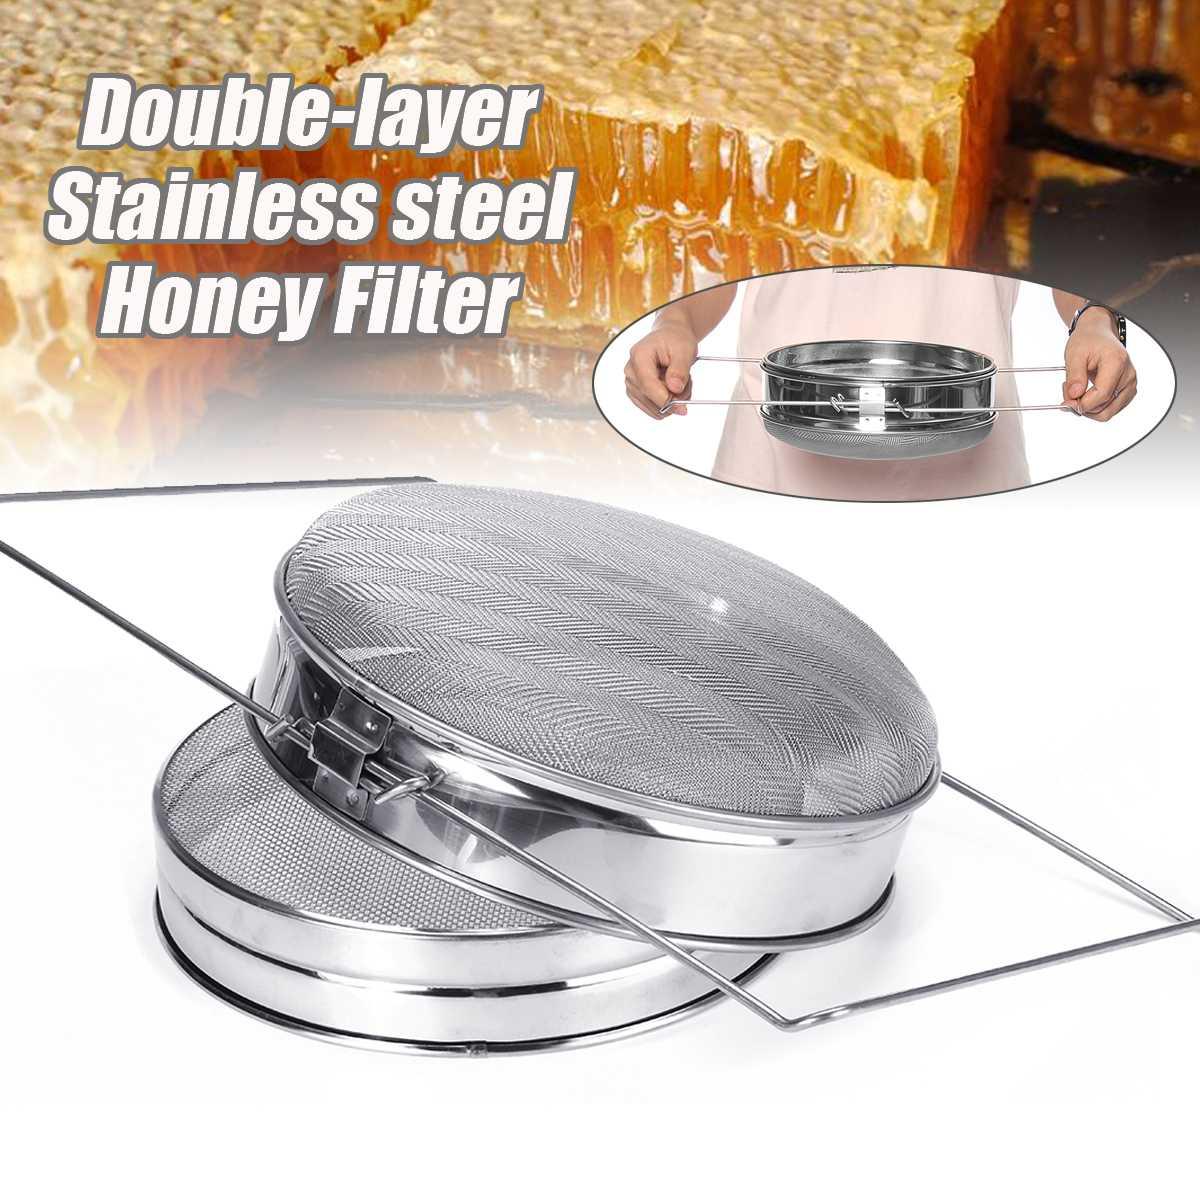 Beekeeping Tools Equipment Honey Filter Double Layer Sieve Stainless Steel Mesh